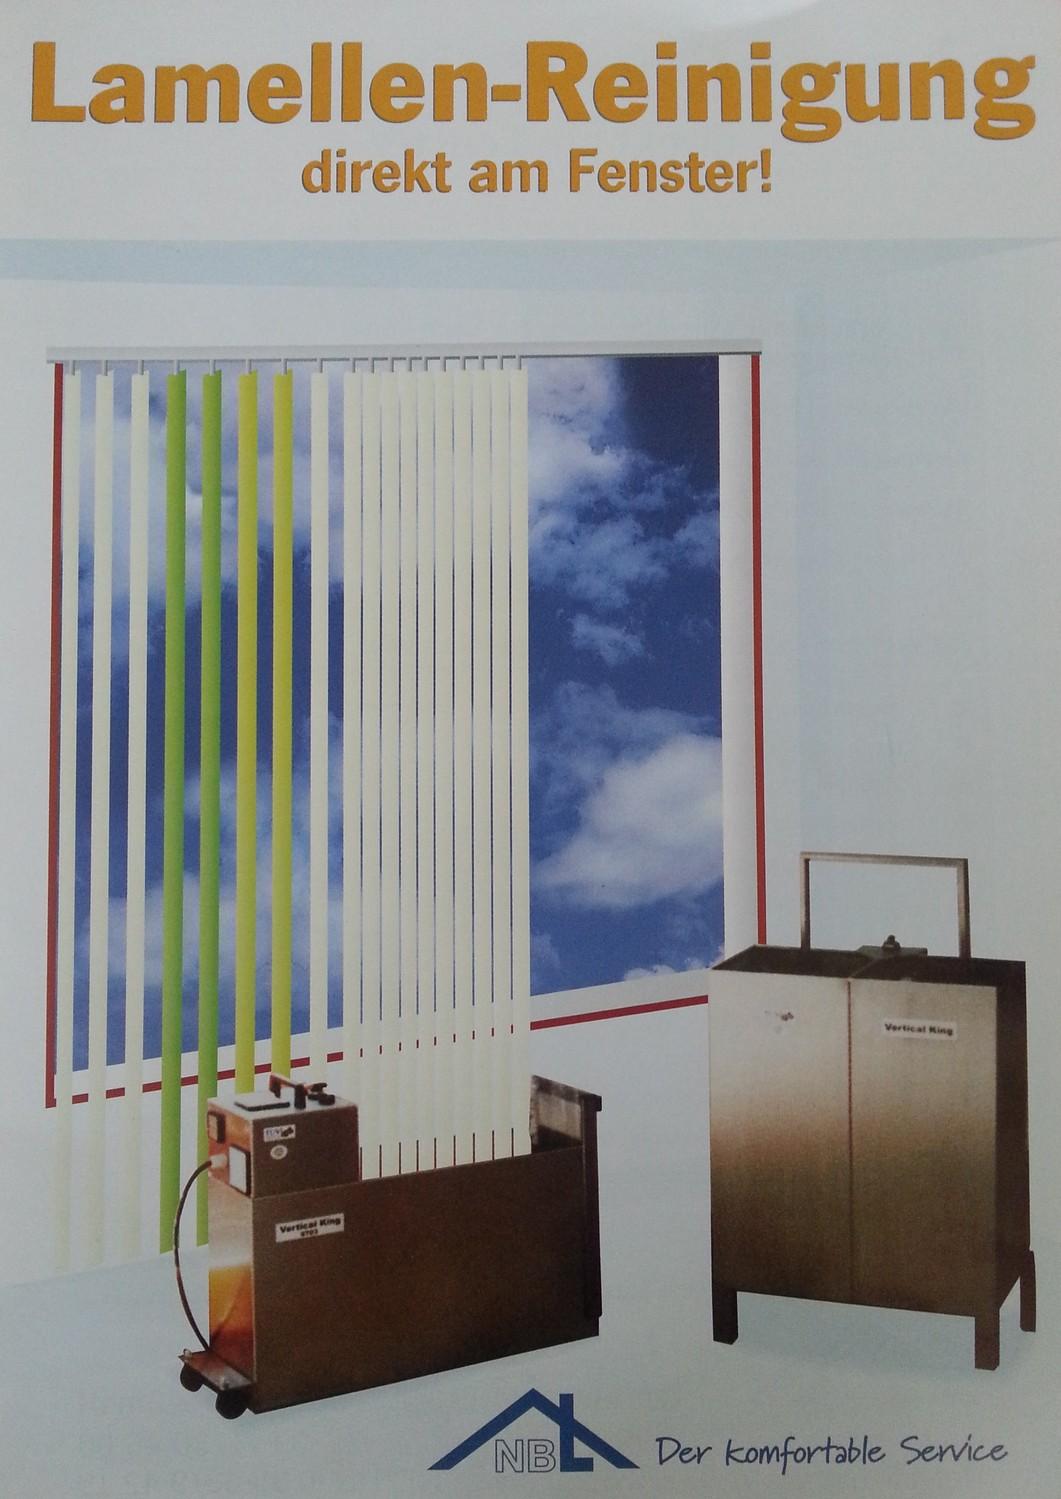 lamellenreinigung direkt am fenster nbl sprembergs webseite. Black Bedroom Furniture Sets. Home Design Ideas